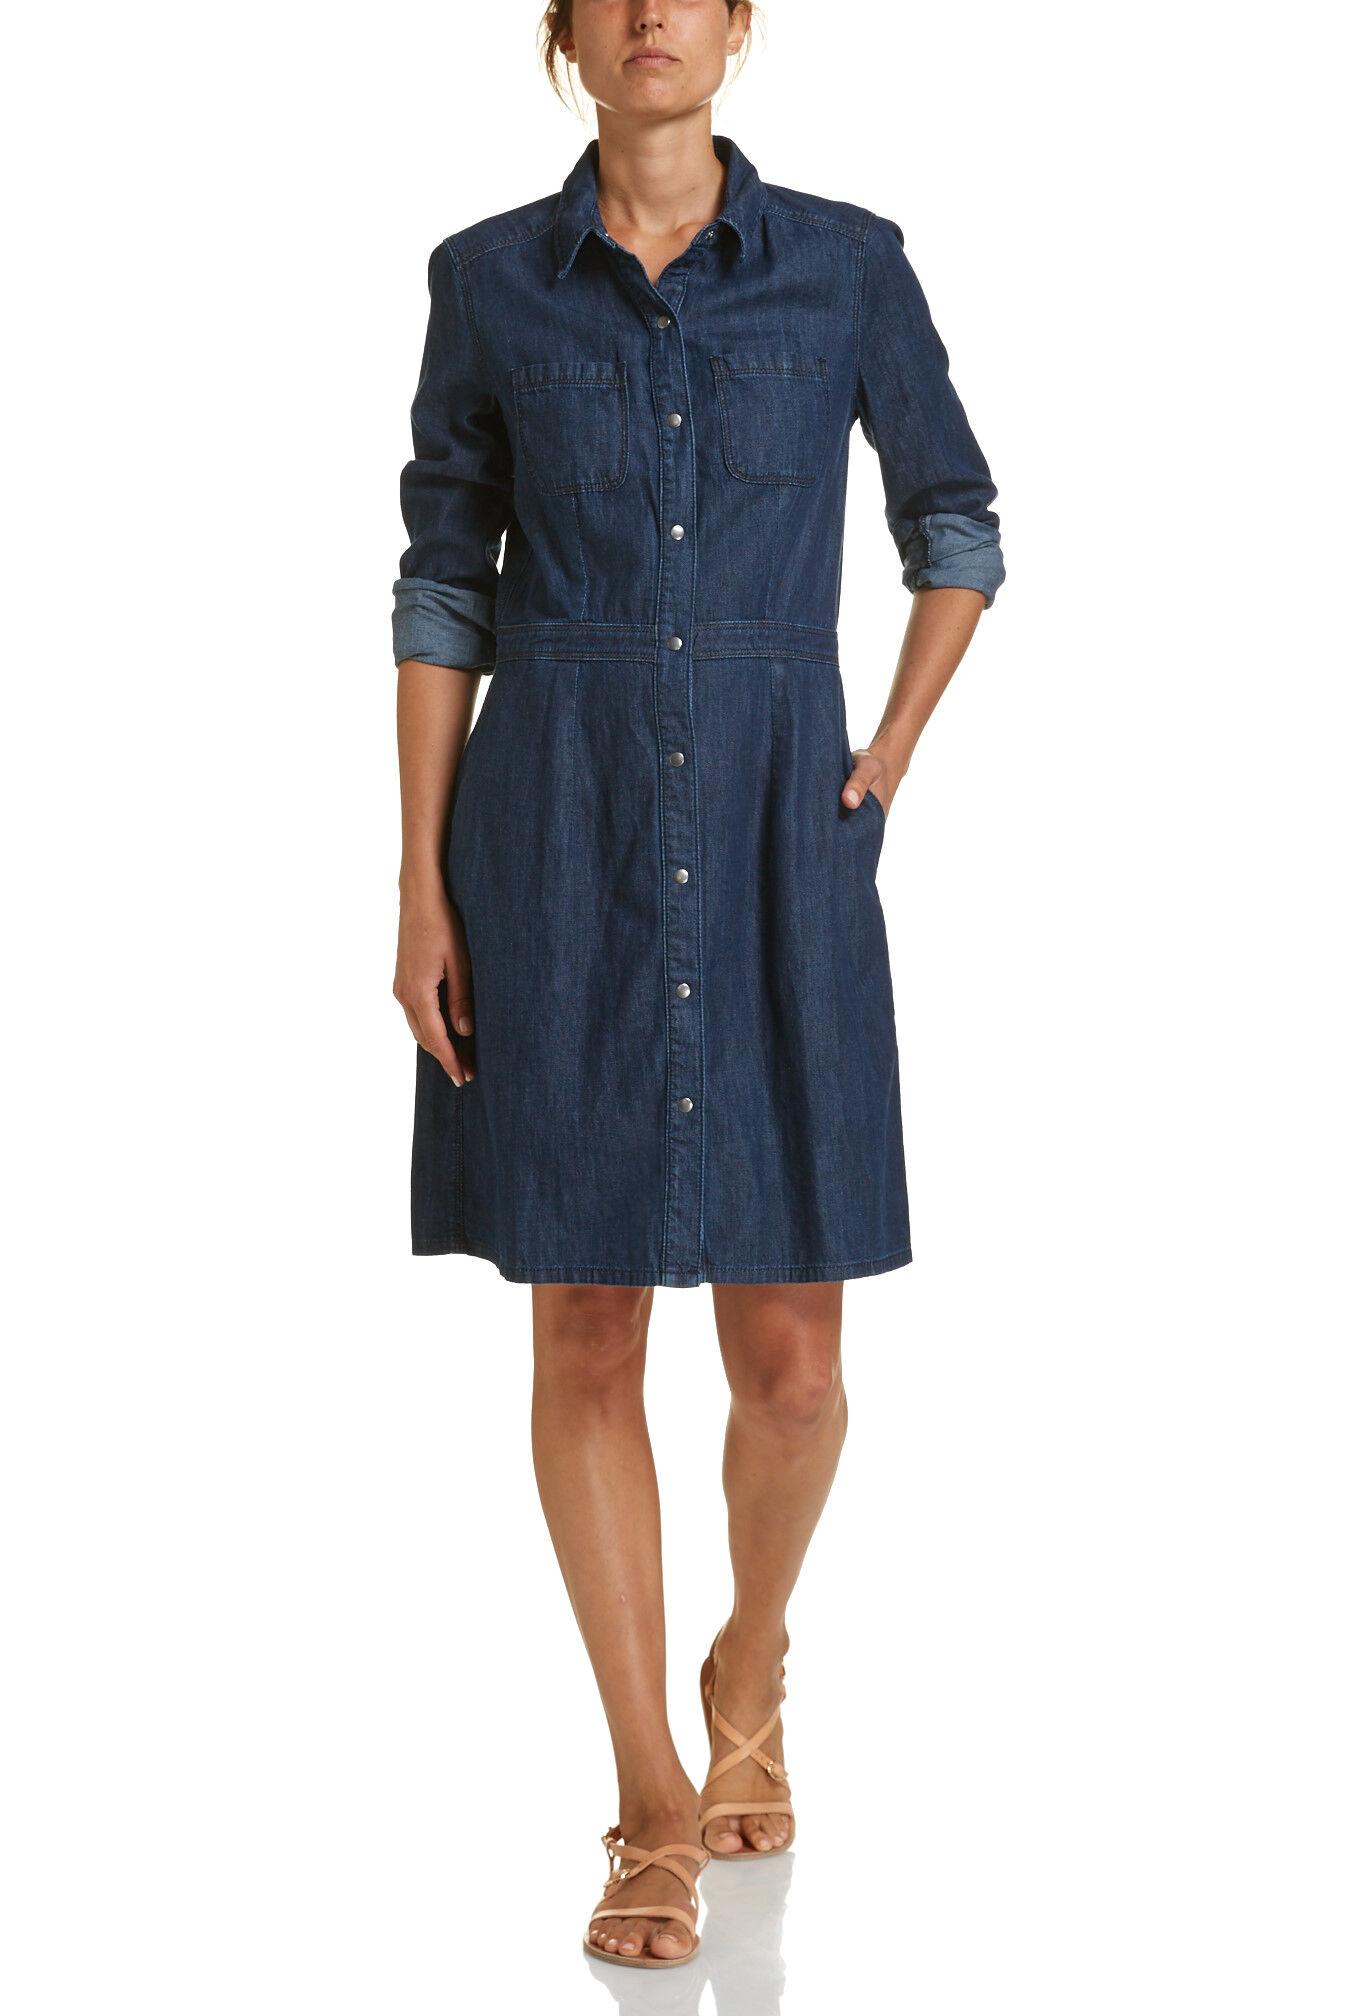 NEW JAG WOMENS Denim Snap Dress Dresses | eBay